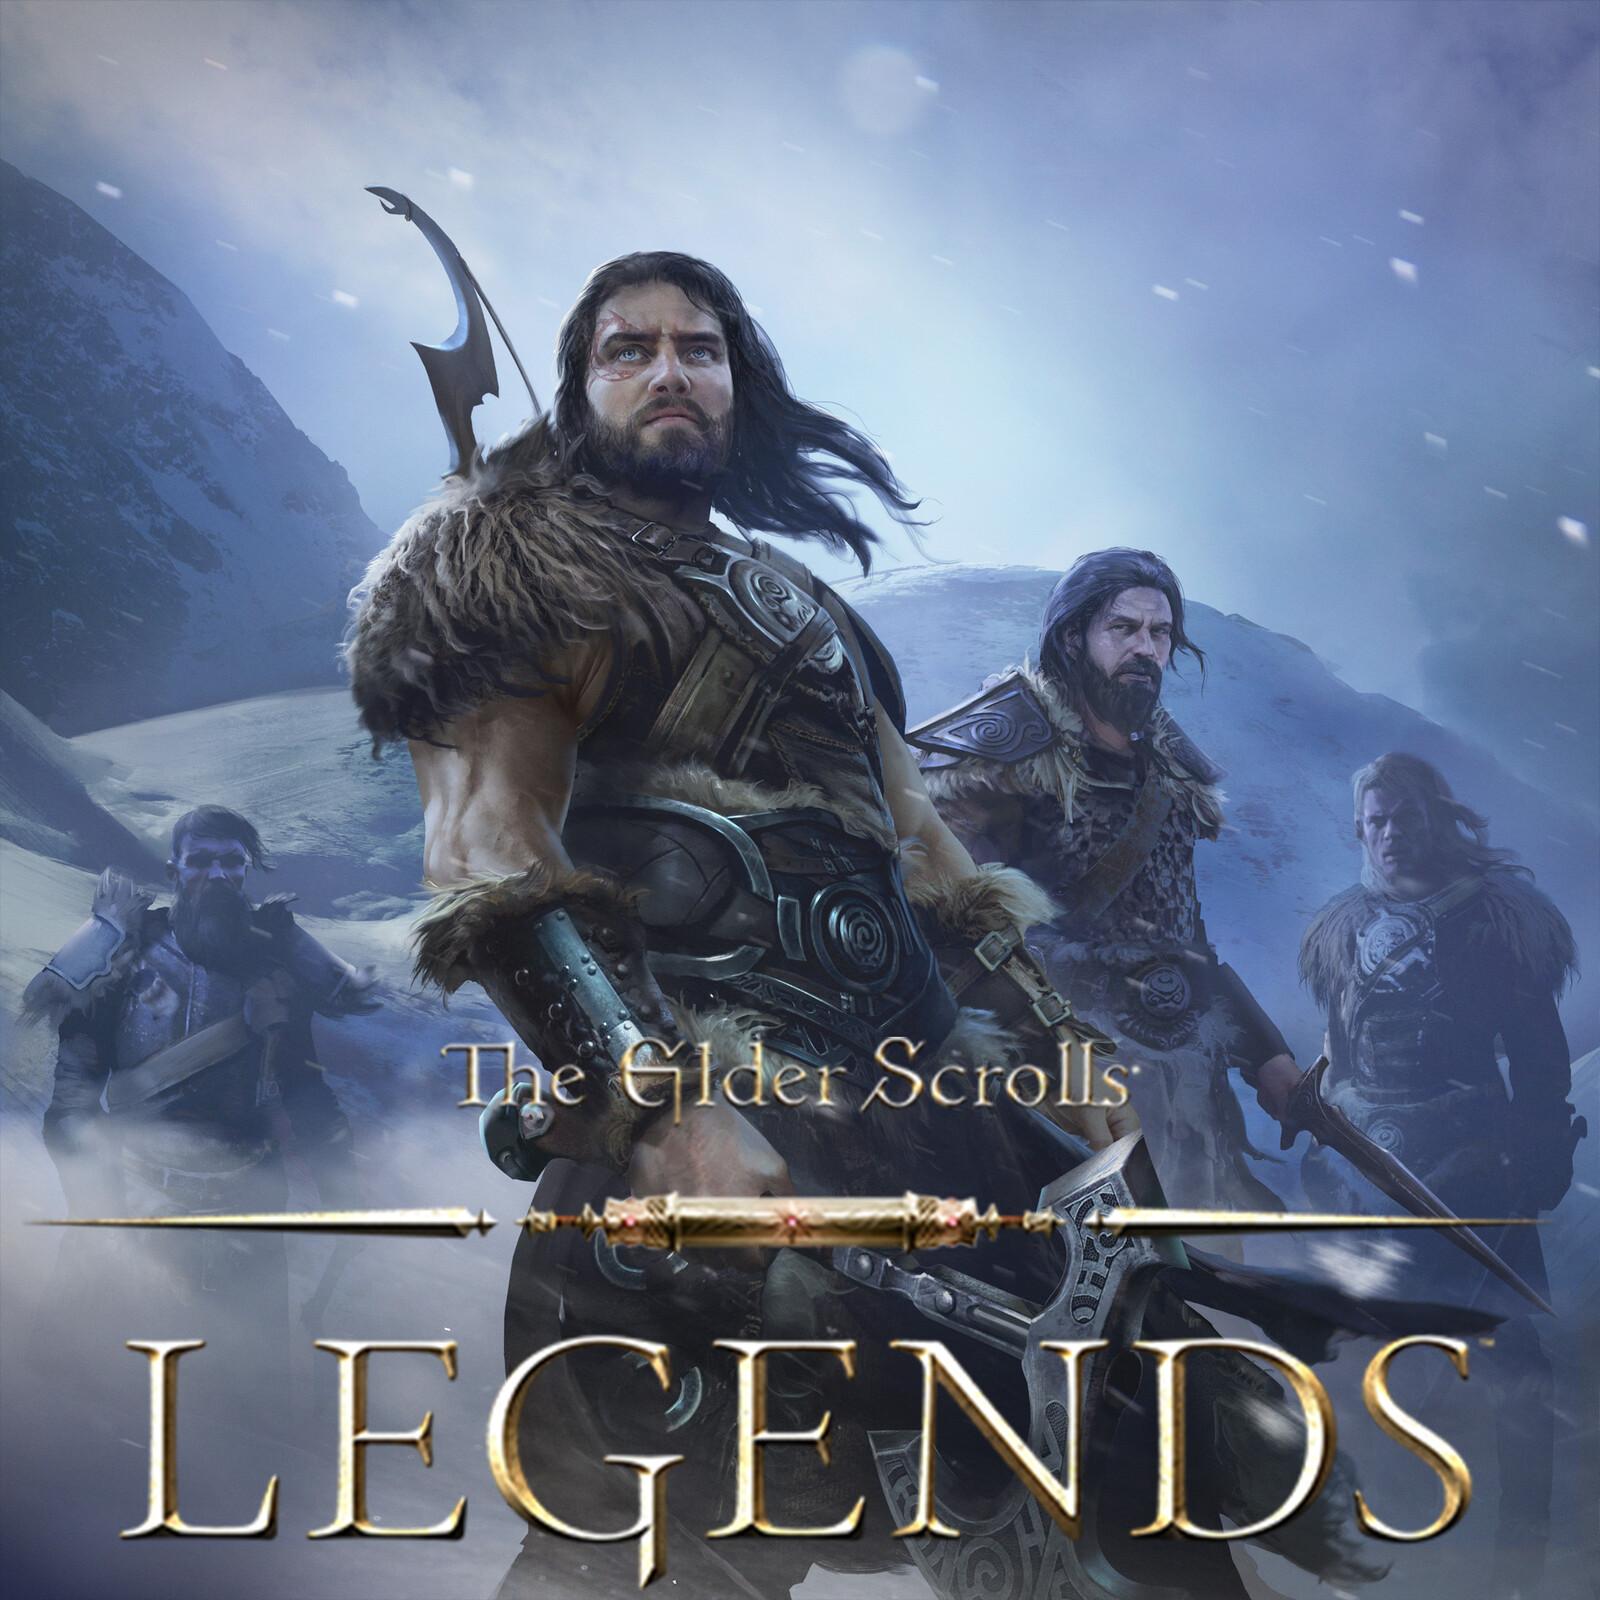 Raiding party - The Elder Scrolls: Legends